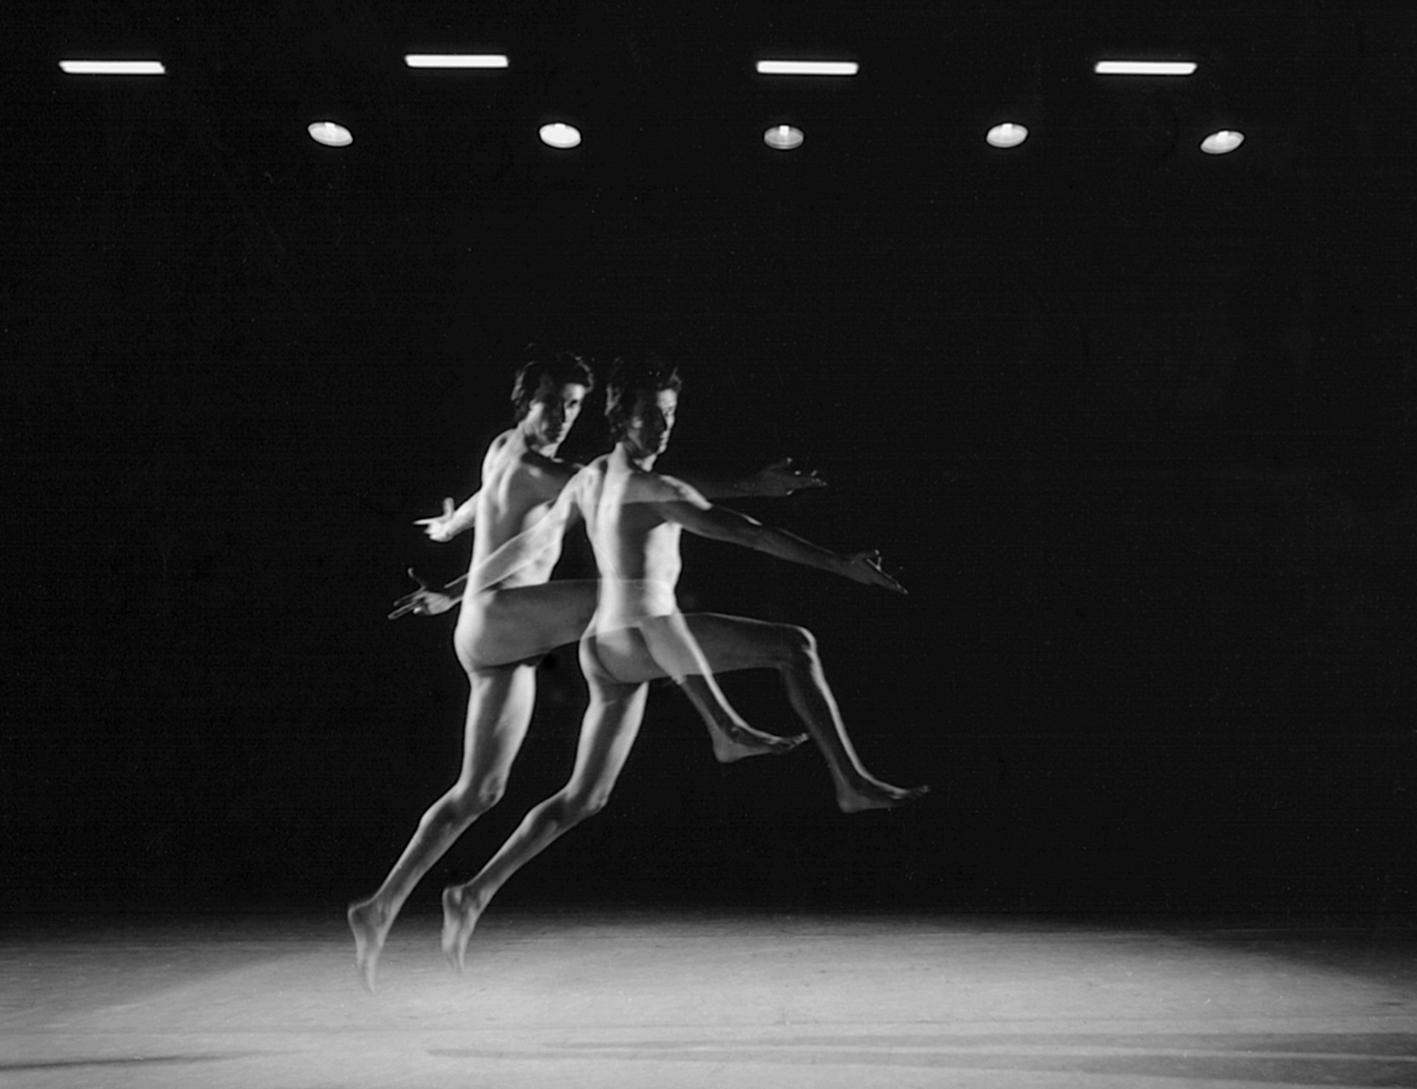 Nureyev and Helpman after Duchamp (Nude Descending a Staircase) , Silver gelatin print, 100 x 77cm, 2013.